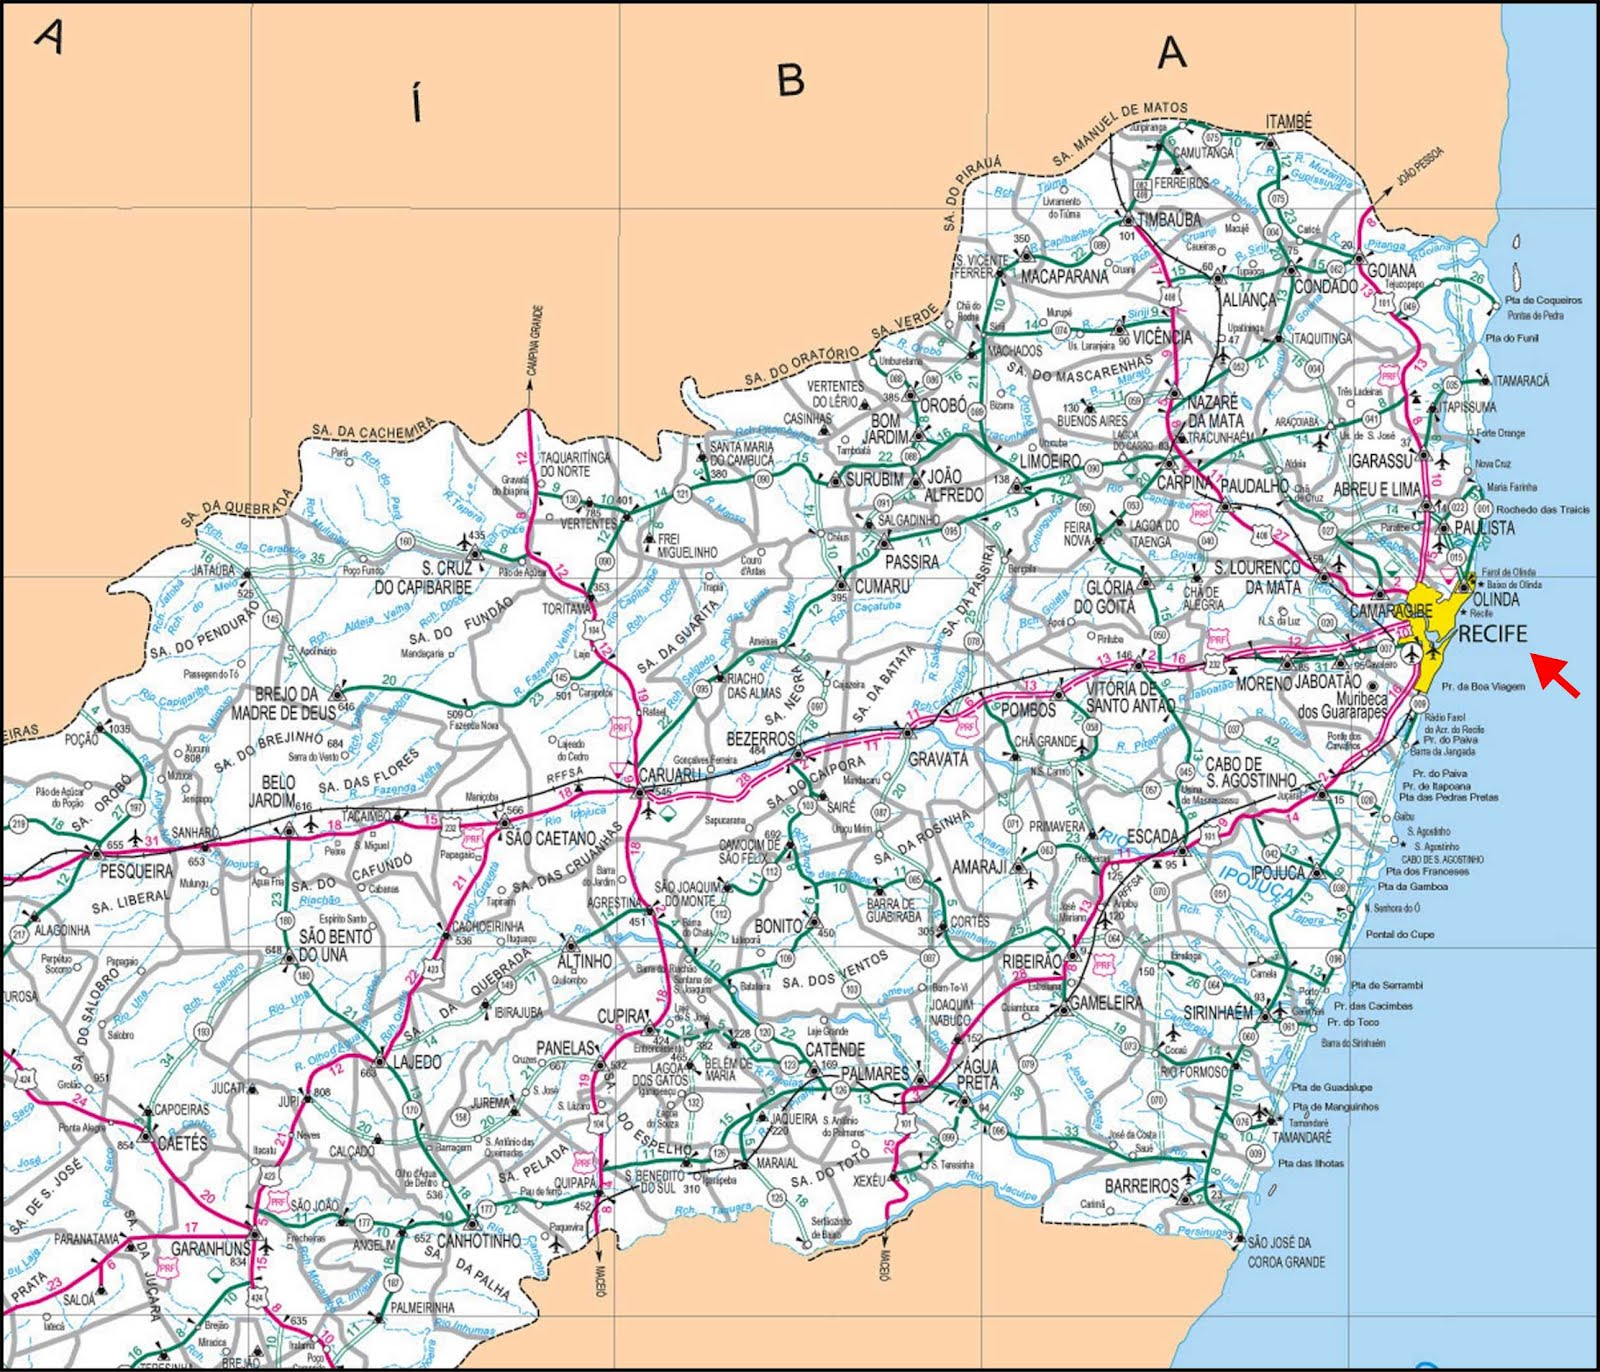 mapa-rodoviario-localizacao-recife-.jpg